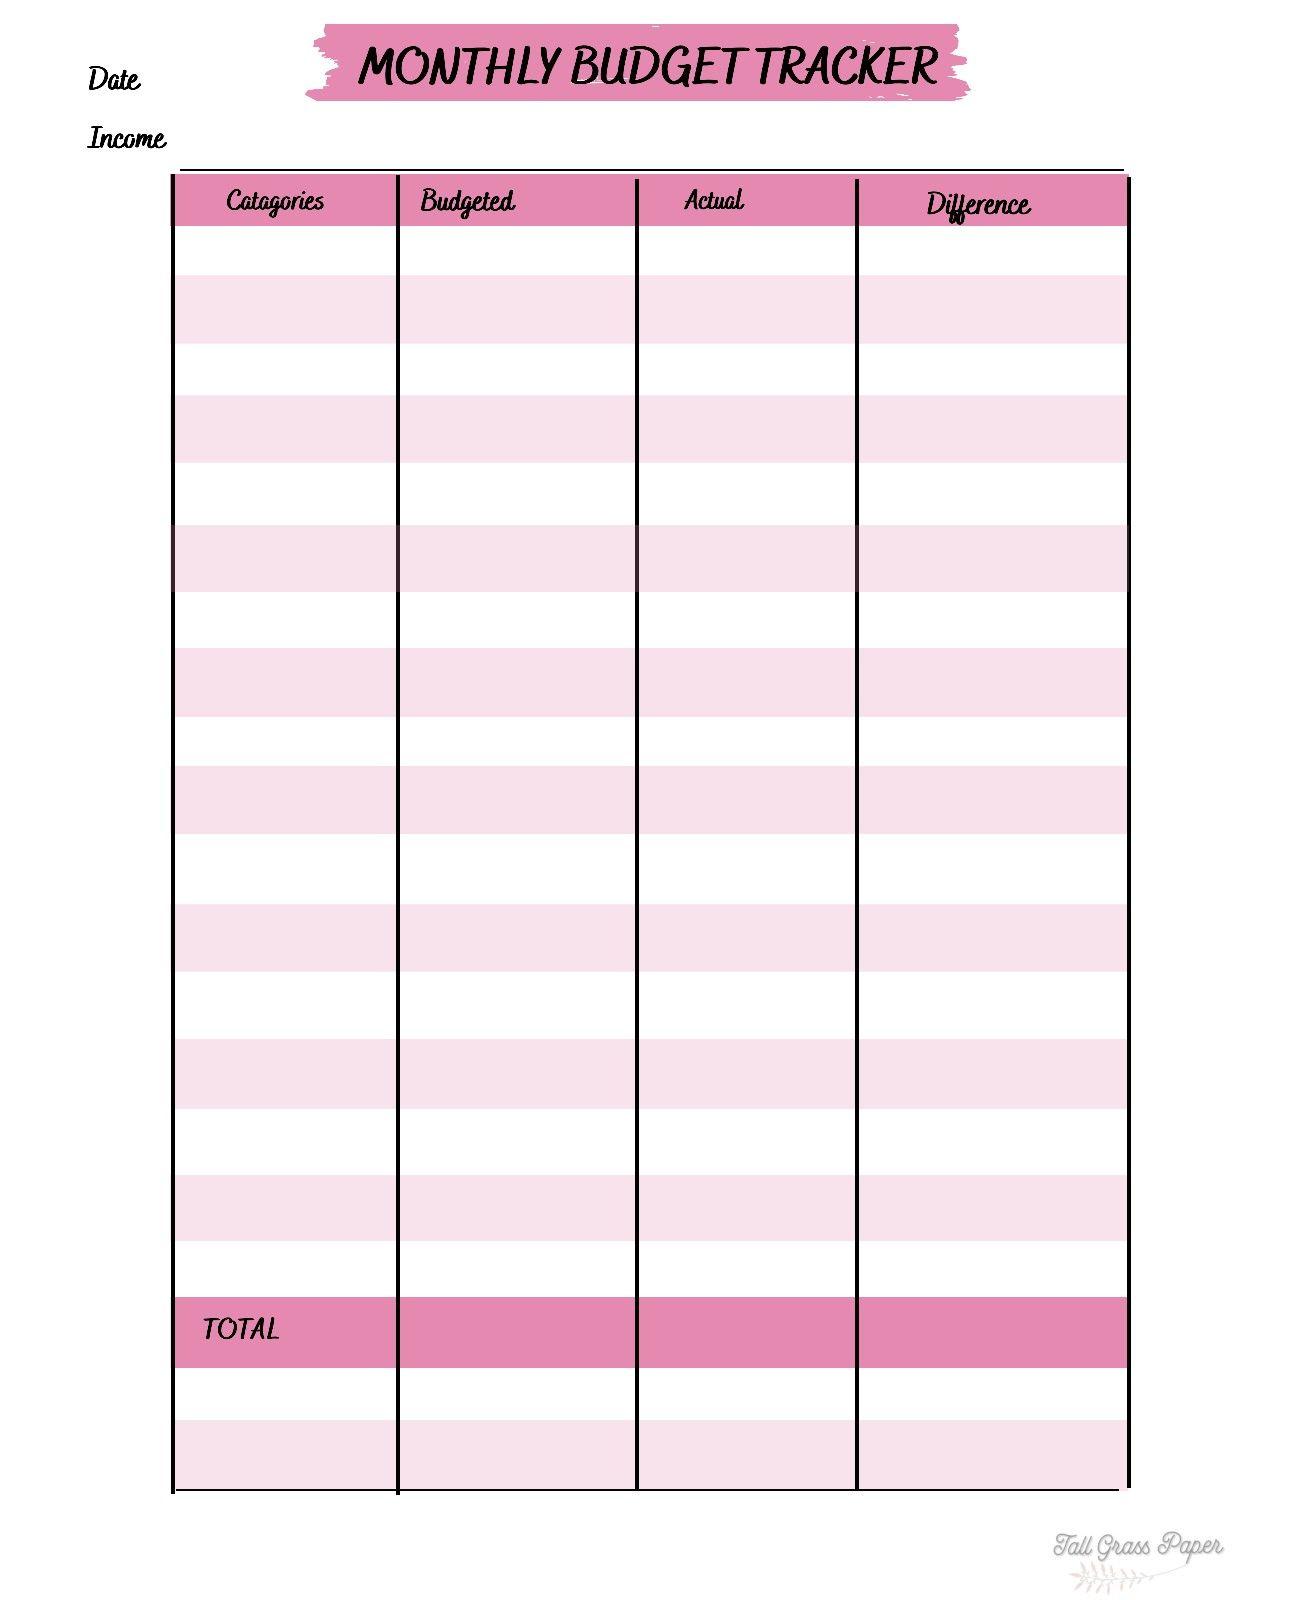 Budget Tracker Expense Tracker Money Tracking Sheet